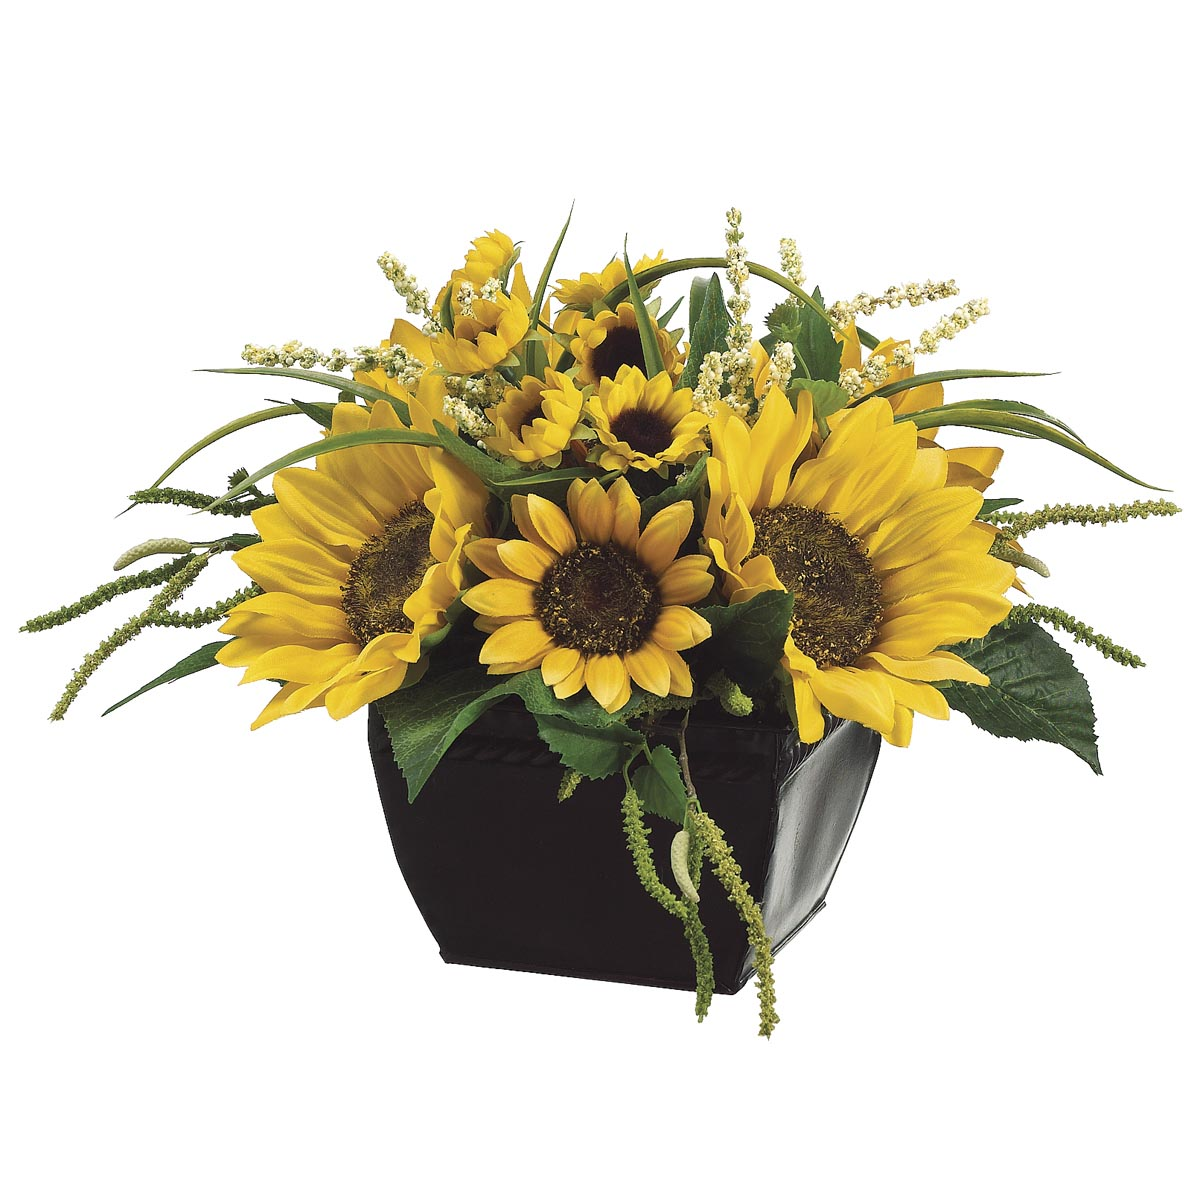 Inch sunflower and amaranthus arrangement in metal